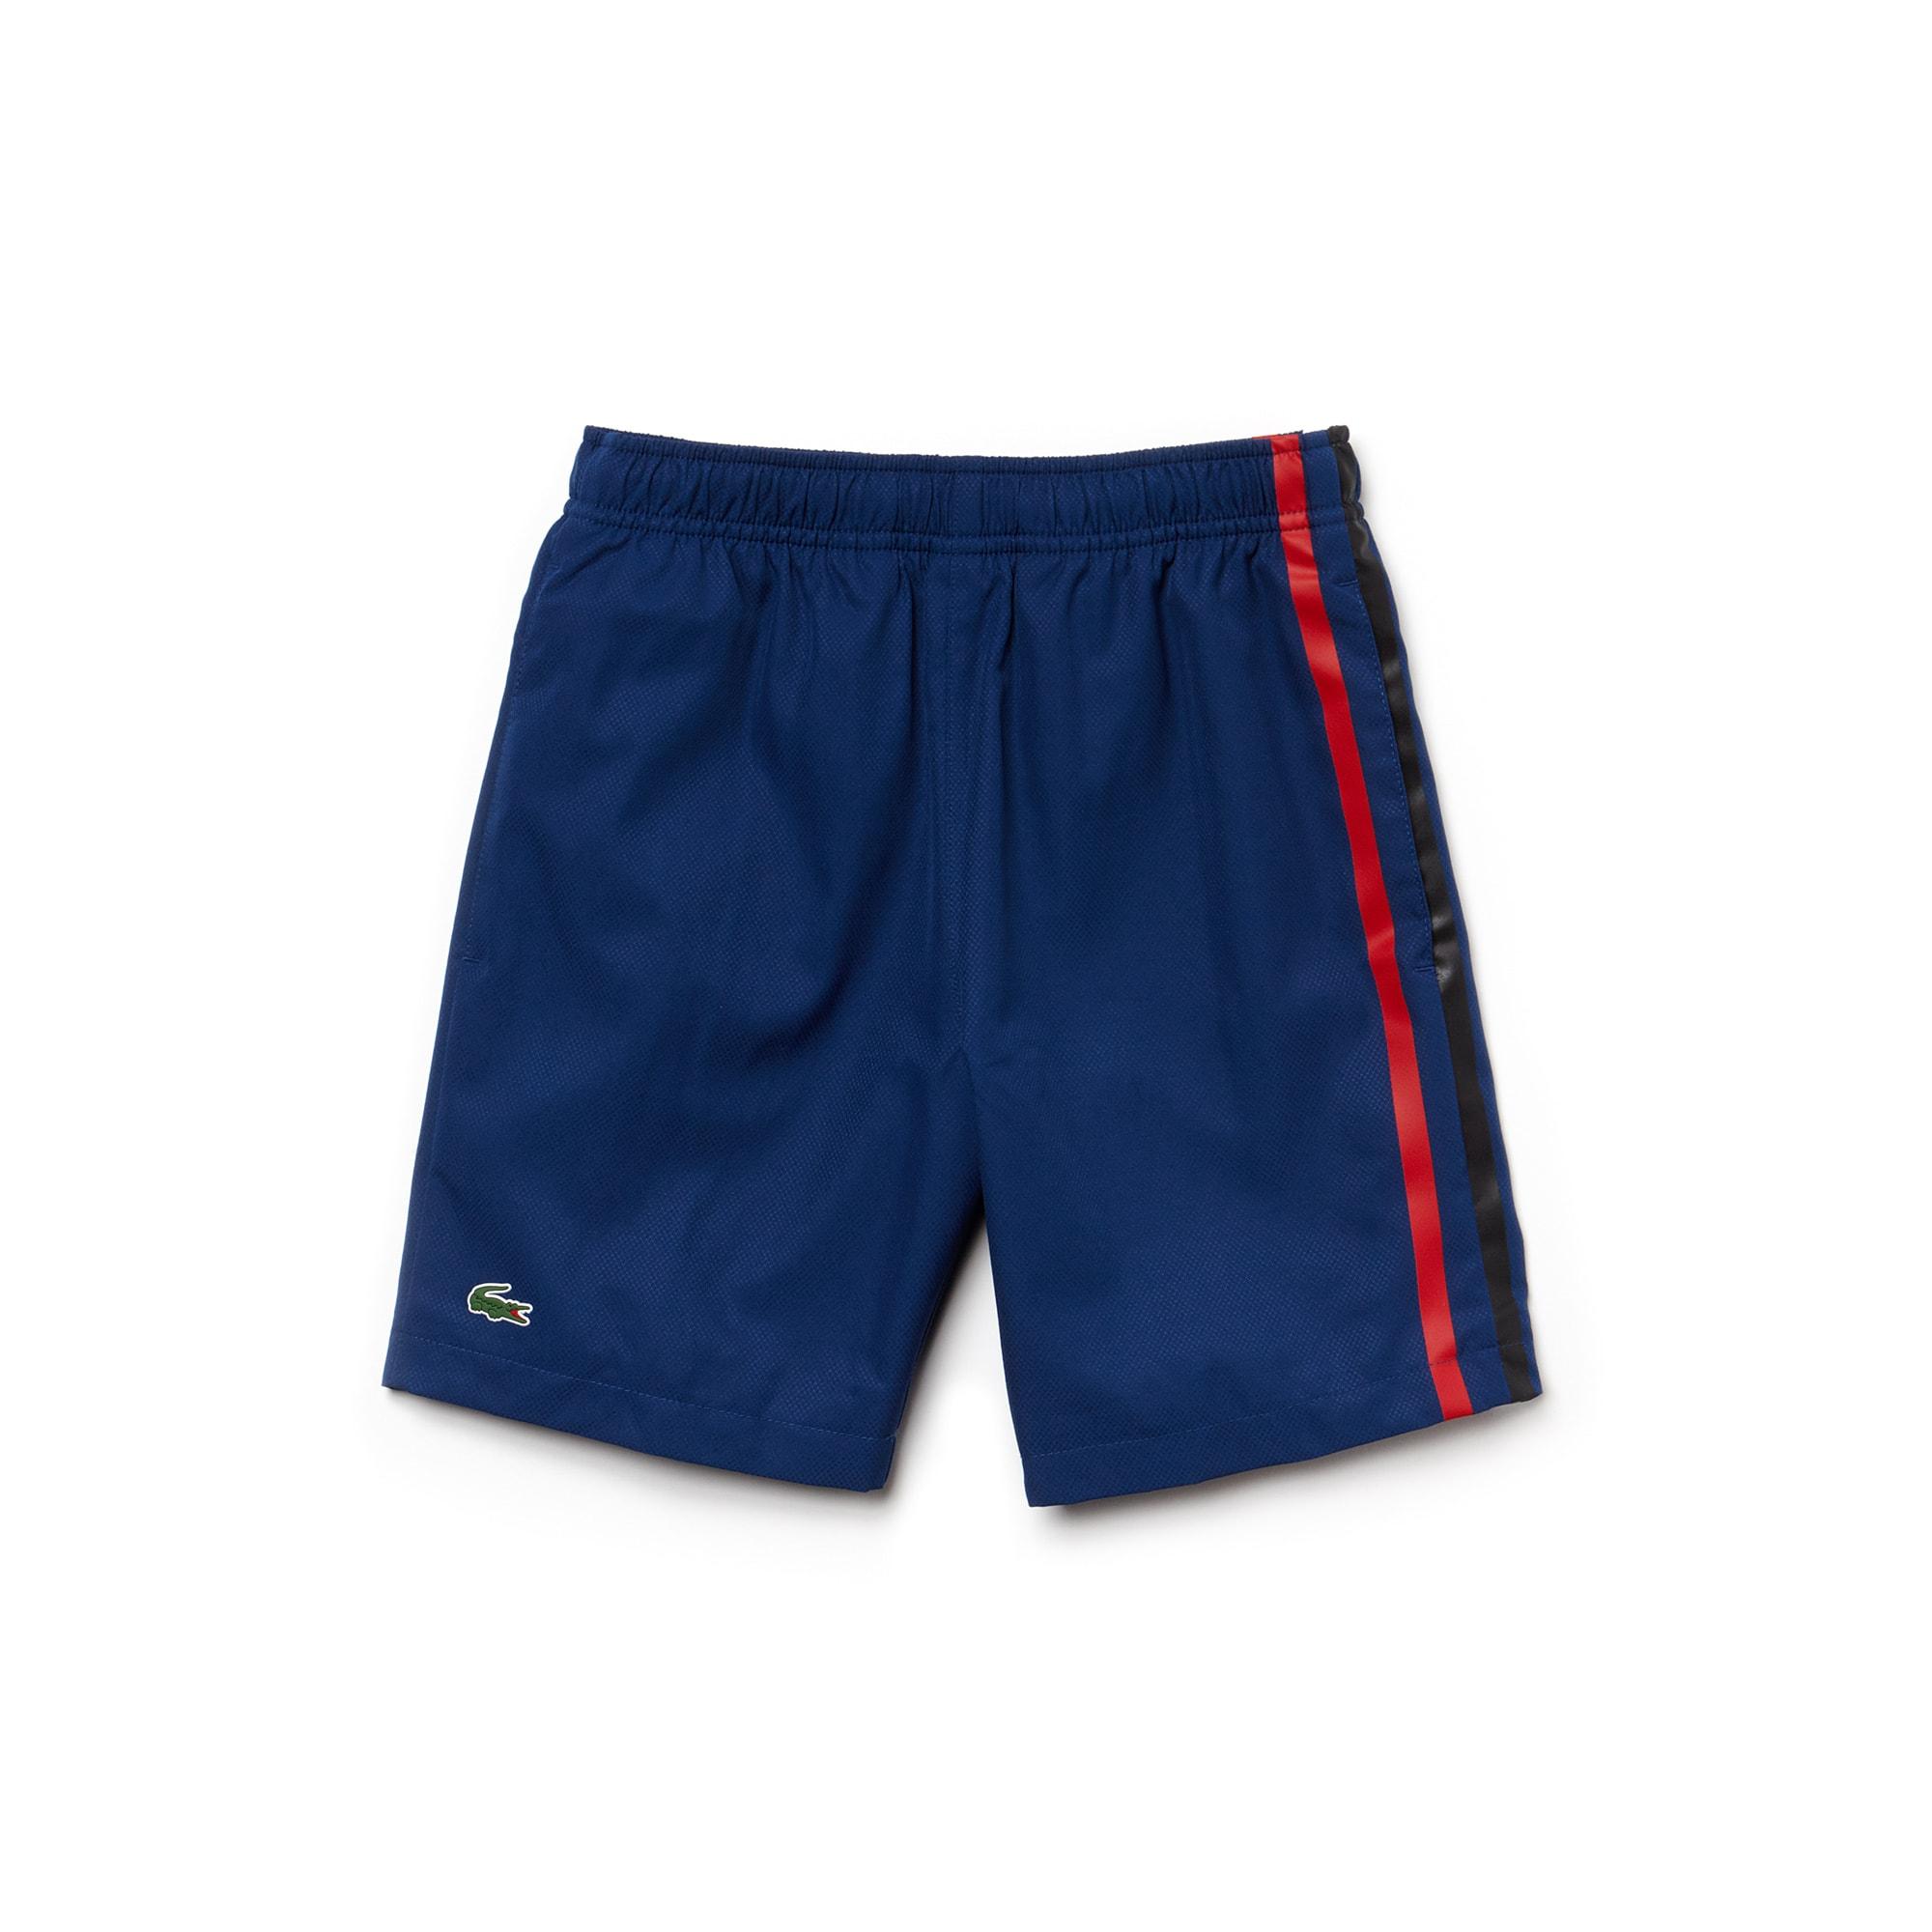 Boys' Lacoste SPORT Colored Bands Taffeta Tennis Shorts